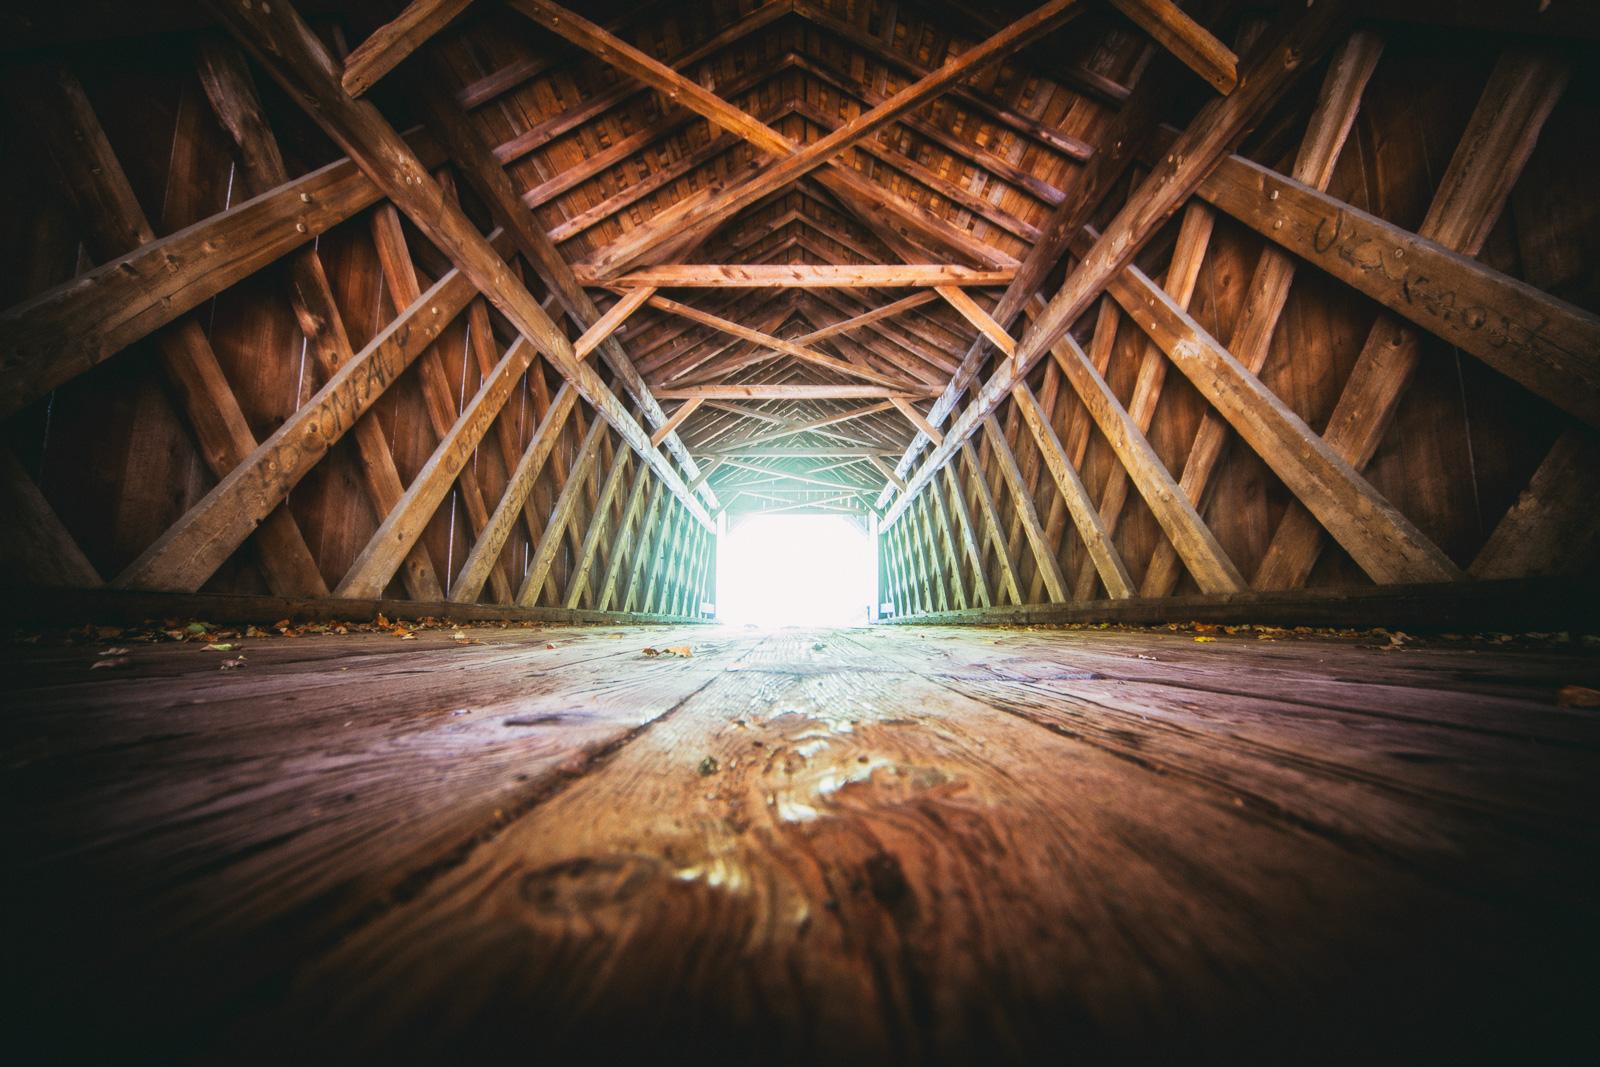 Covered Bridge by Jon Armstrong | Blurbomat.com